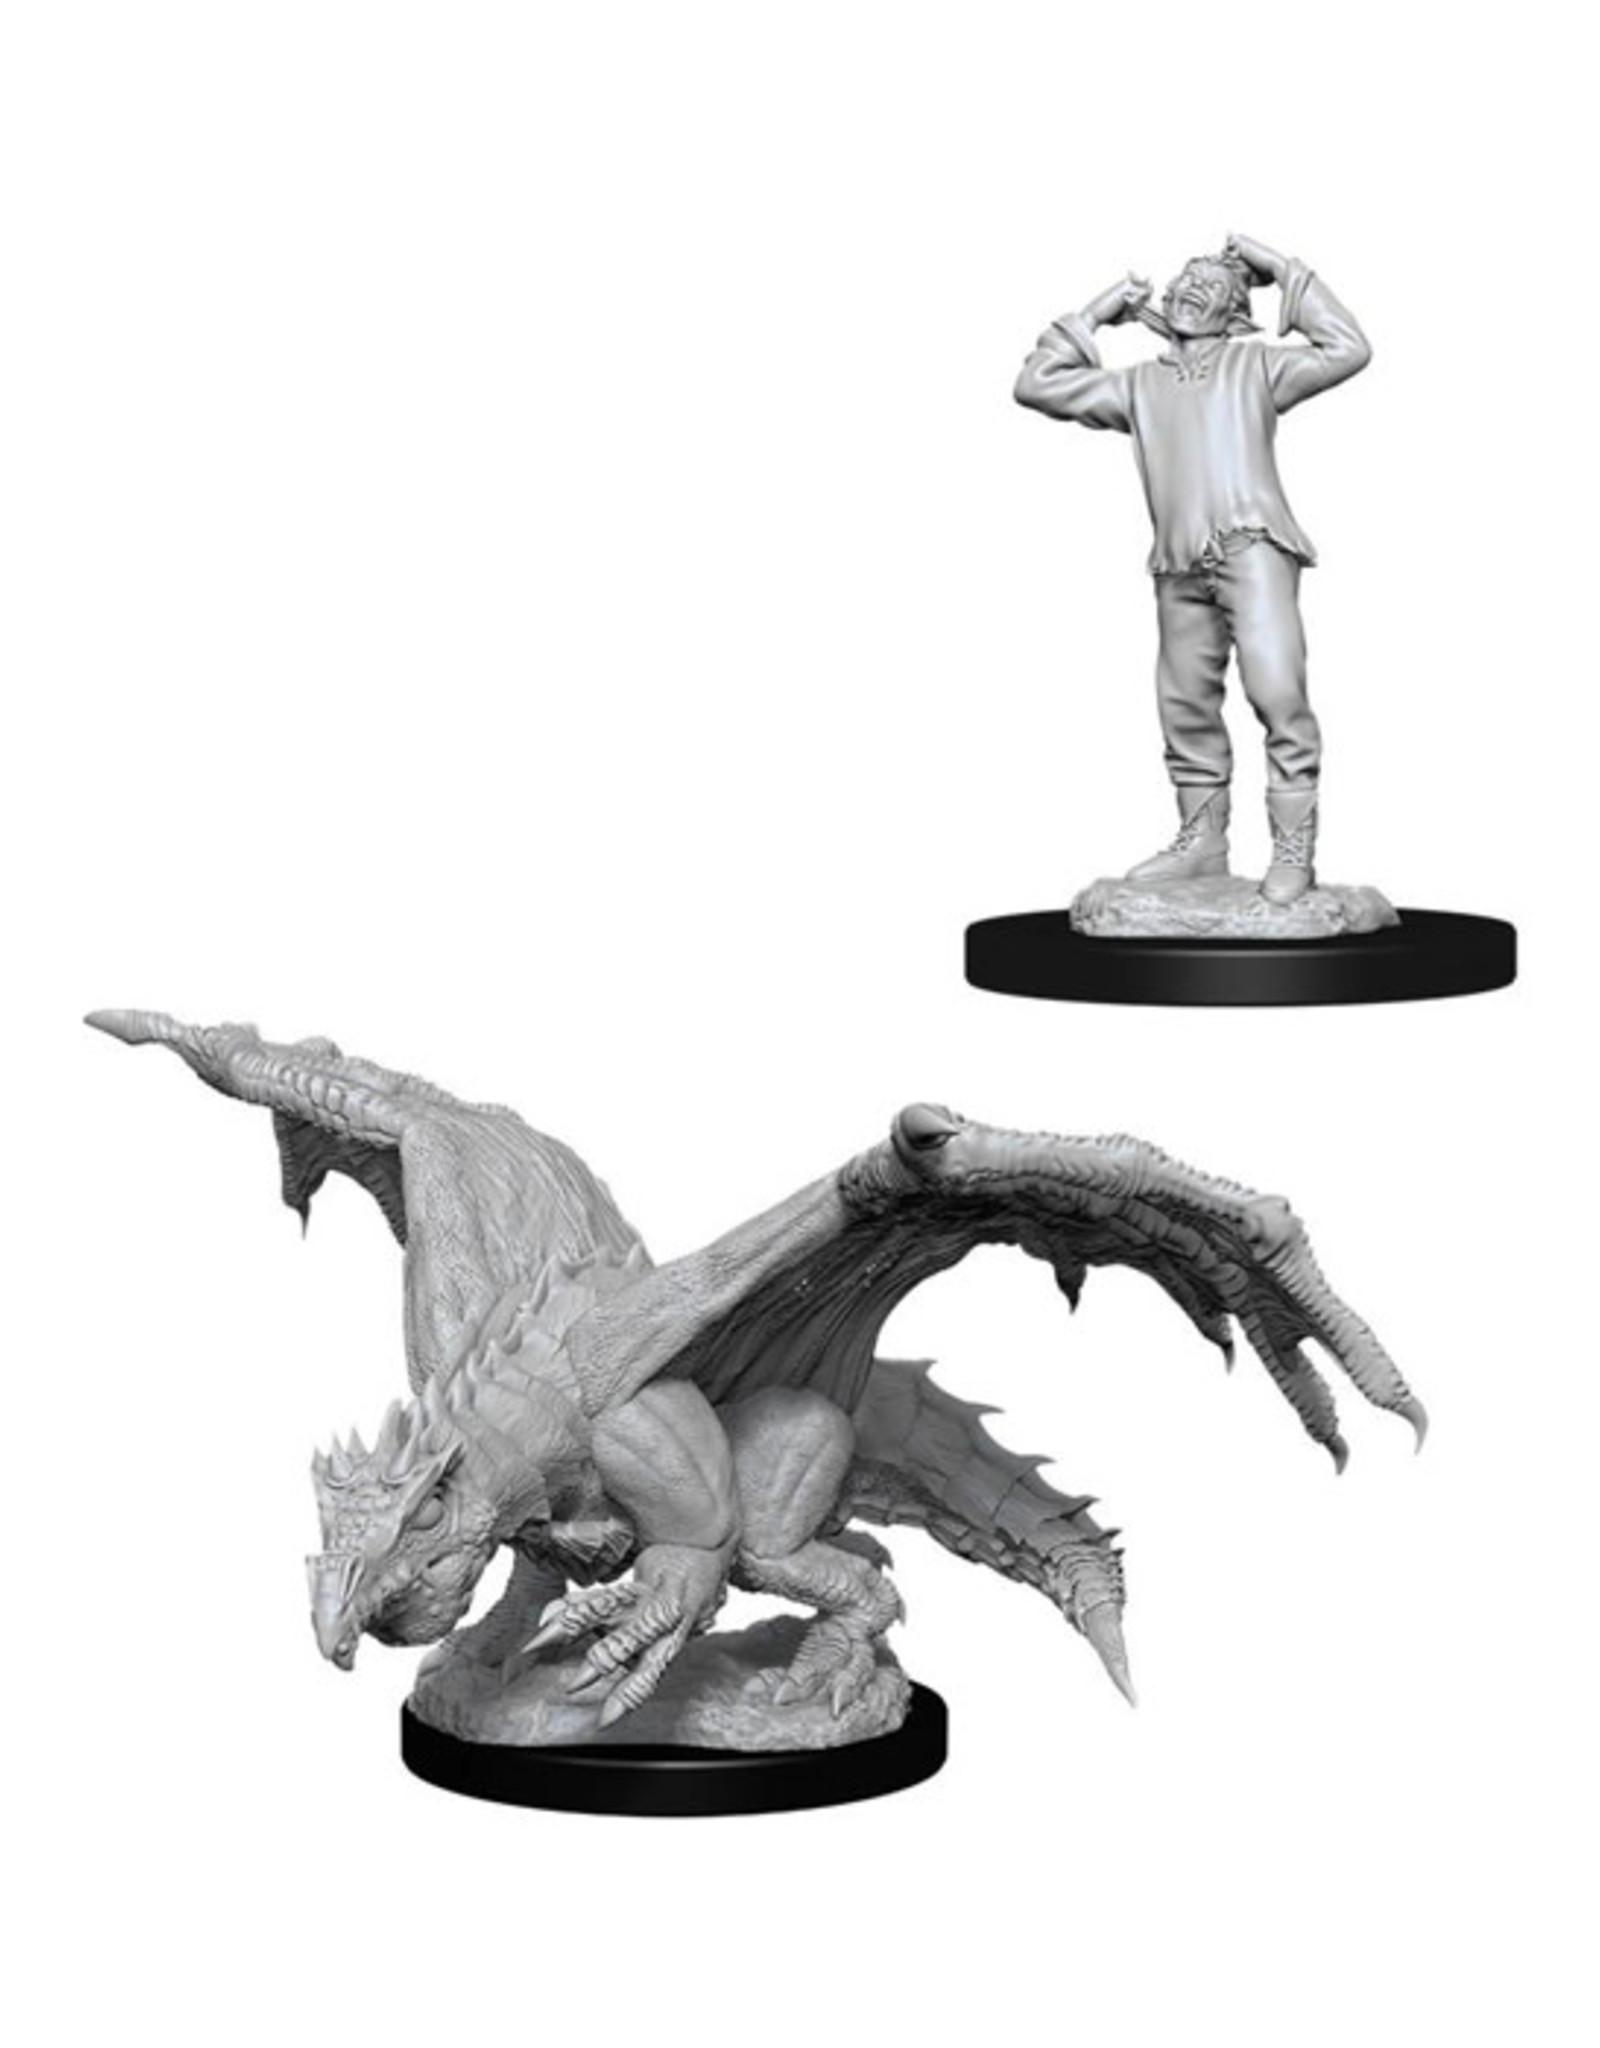 Dungeons & Dragons Dungeons & Dragons: Nolzur's - Green Dragon Wyrmling & Afflicted Elf